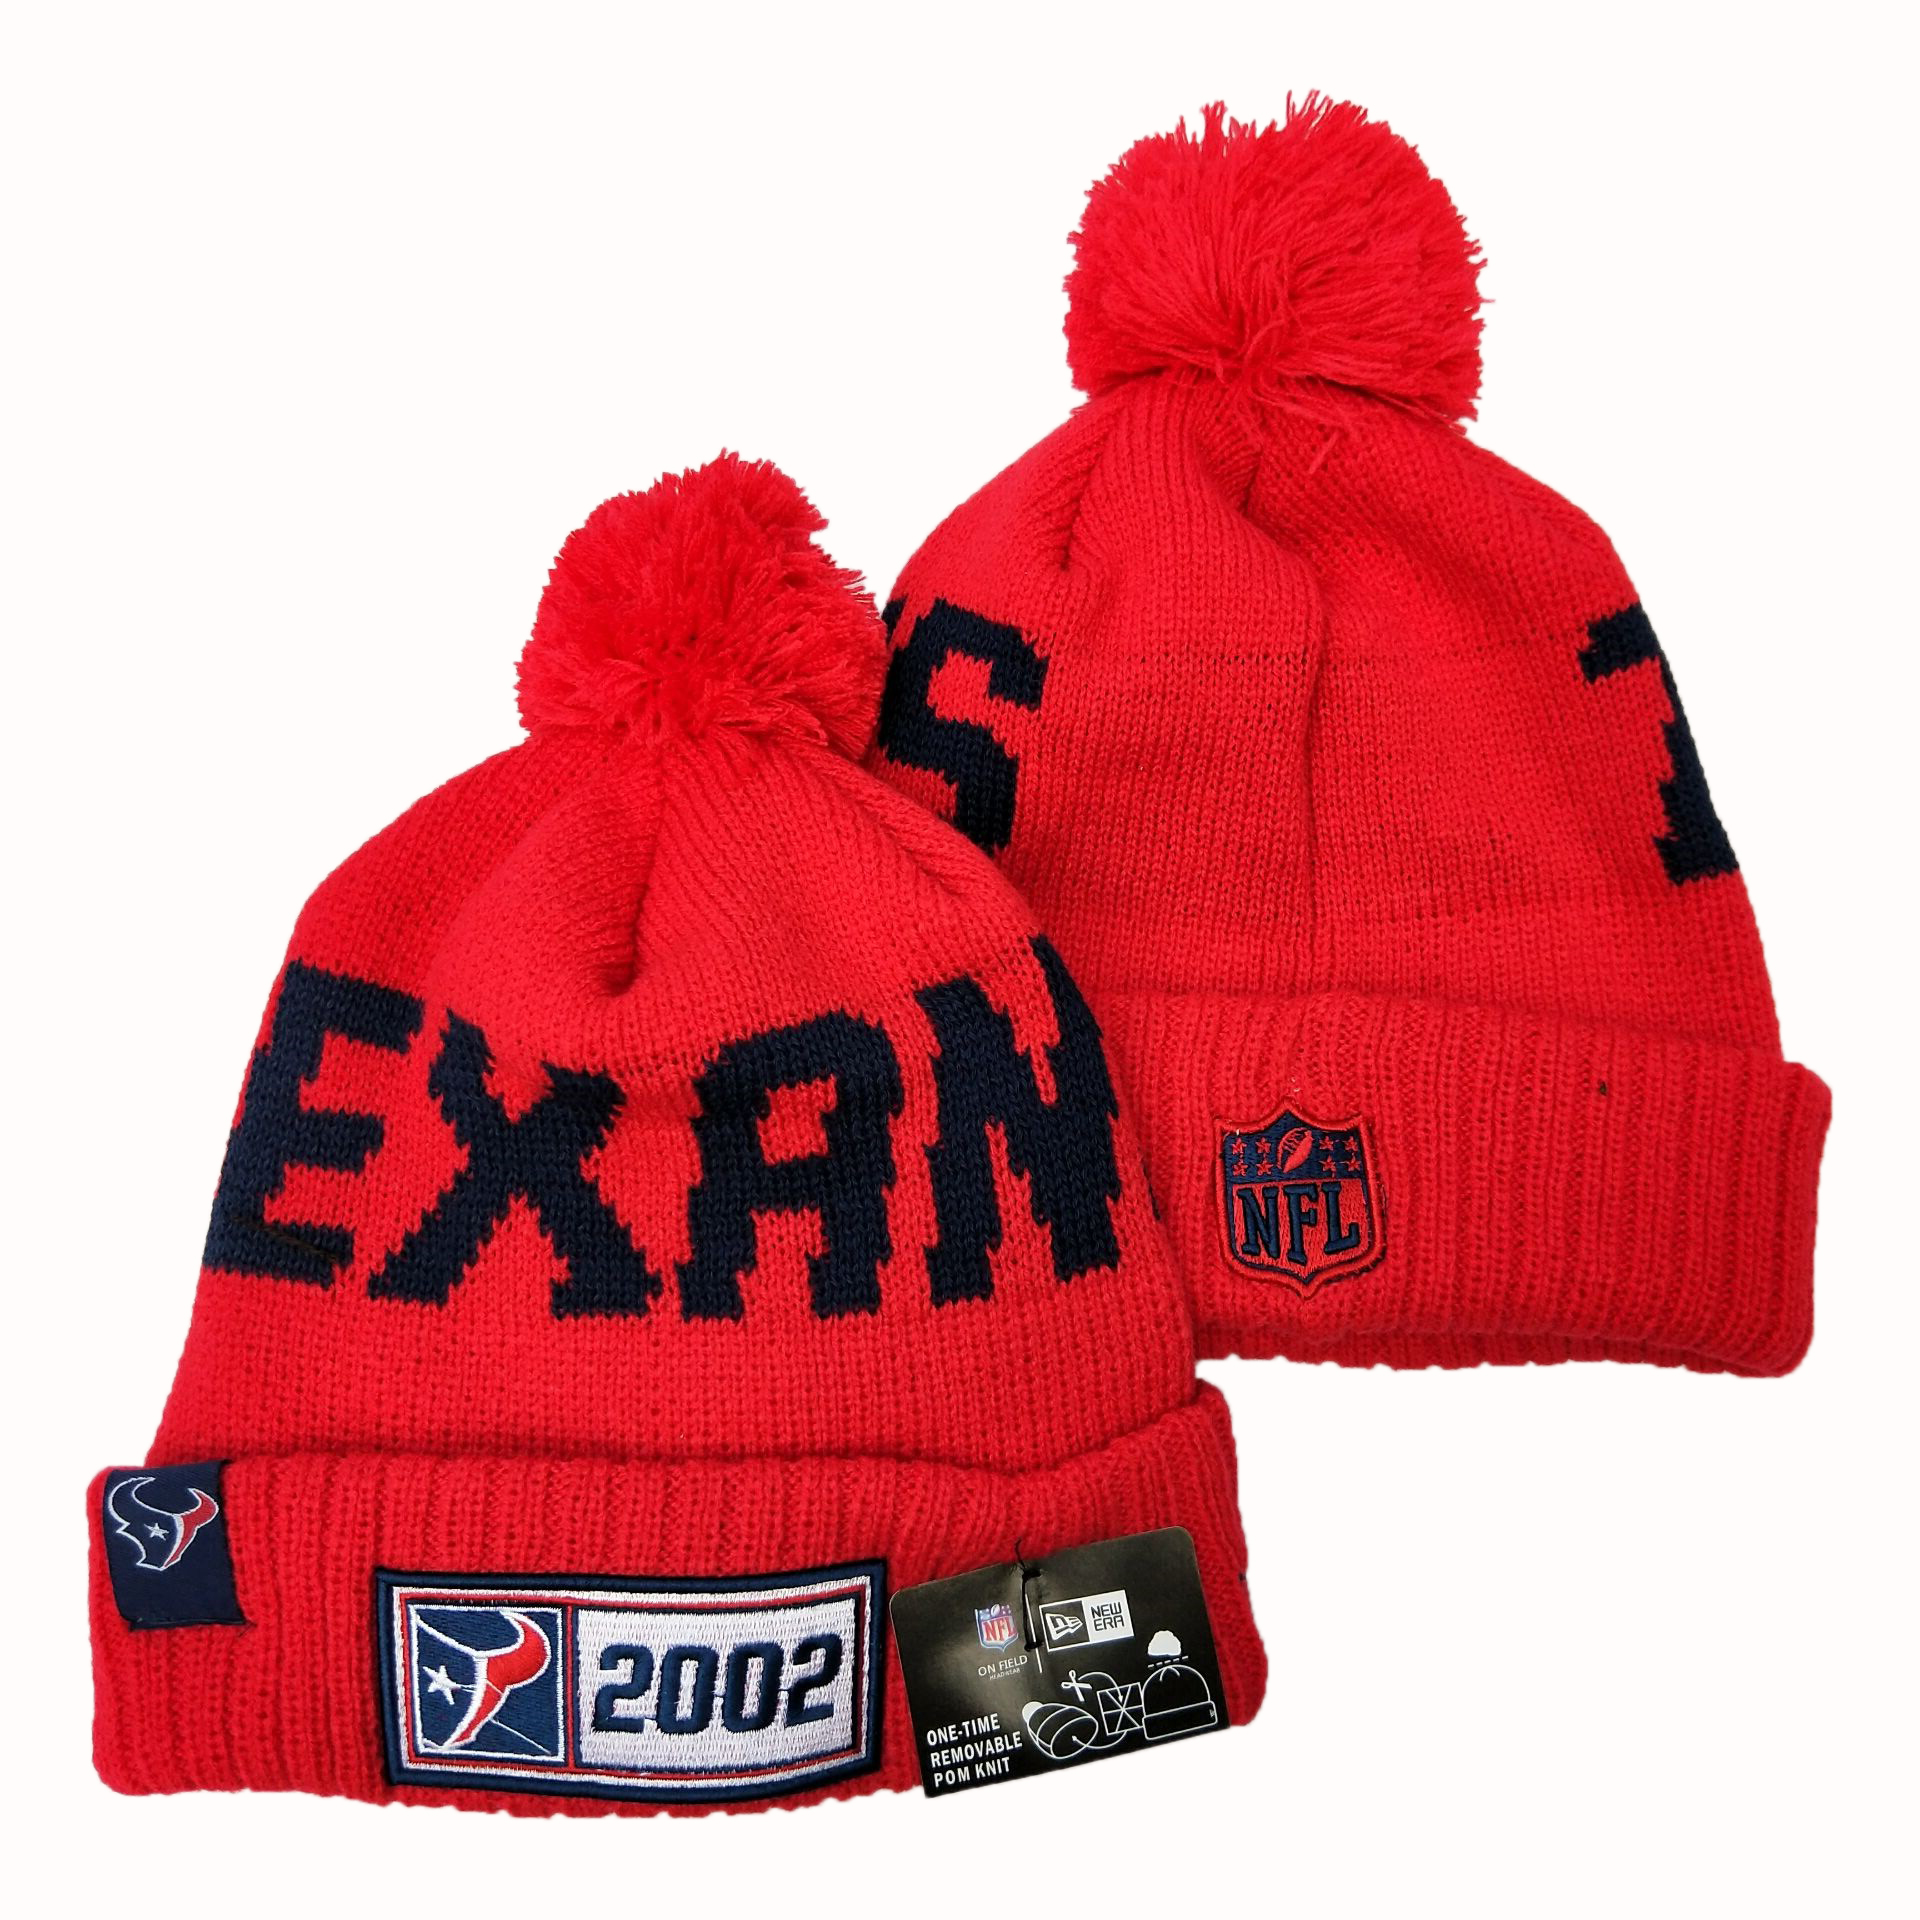 Texans Team Logo Red Pom Knit Hat YD